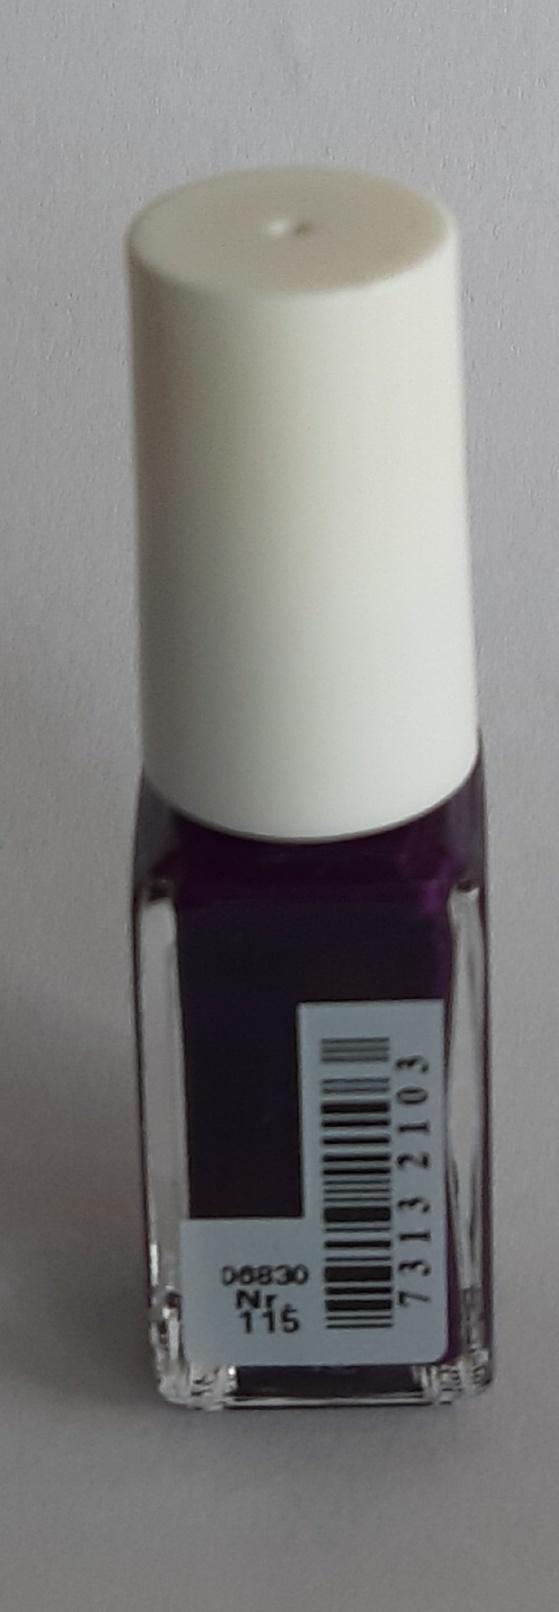 O2 Depend Nagellak zuurstofdoorlatend Nagellak O2 Depend zuurstof doorlatend nr. 115 donker paars